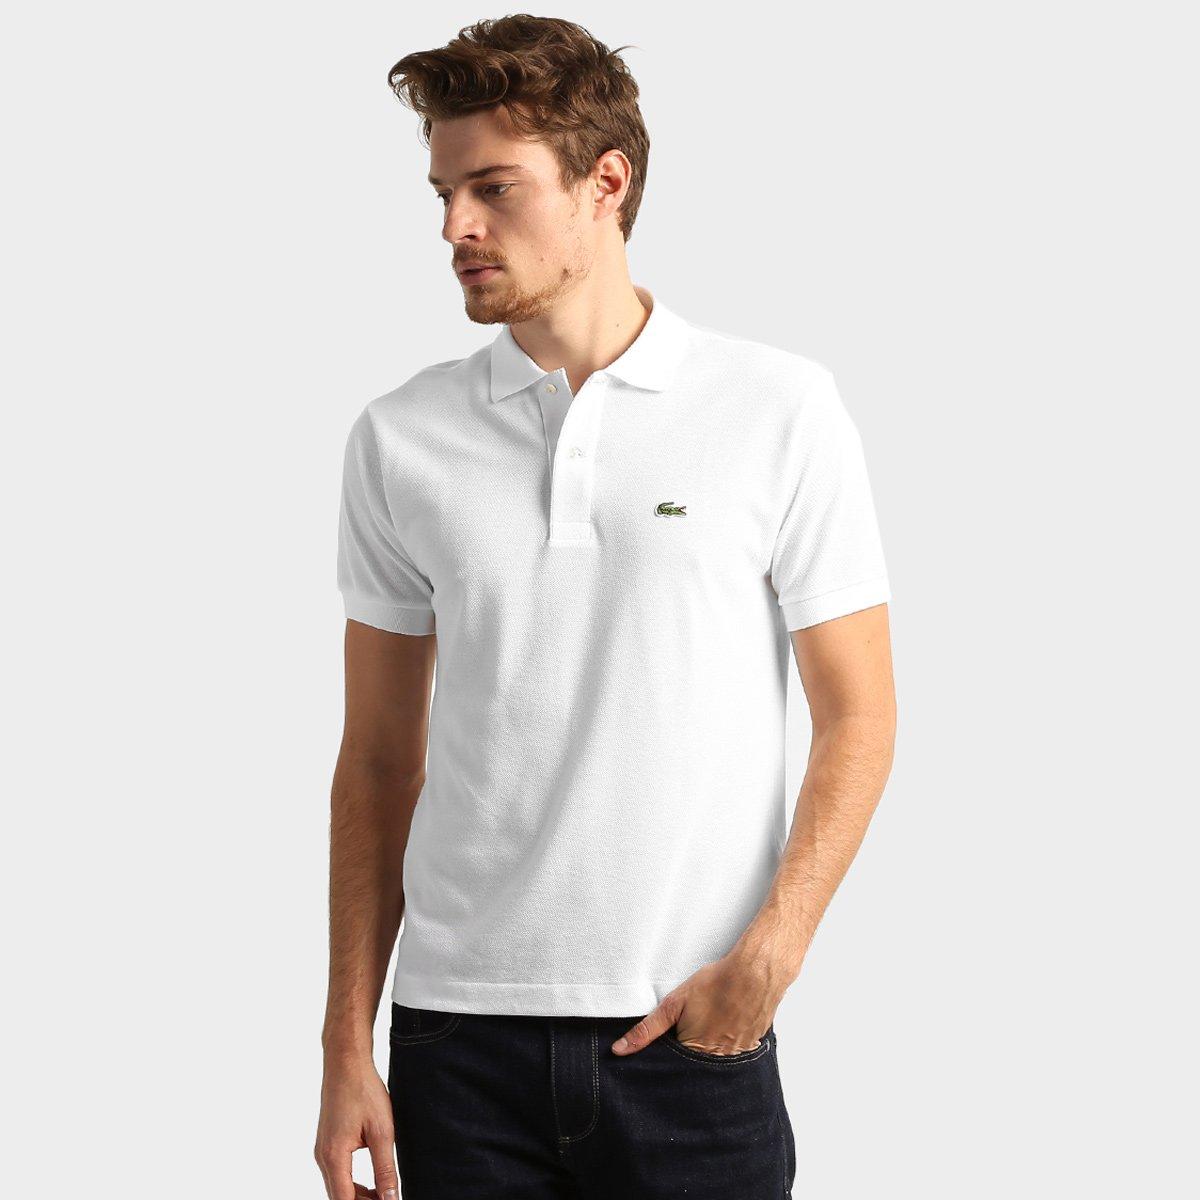 8a51b0c1bdbcd Camisa Polo Lacoste Original Fit Masculina - Branco - Compre Agora ...